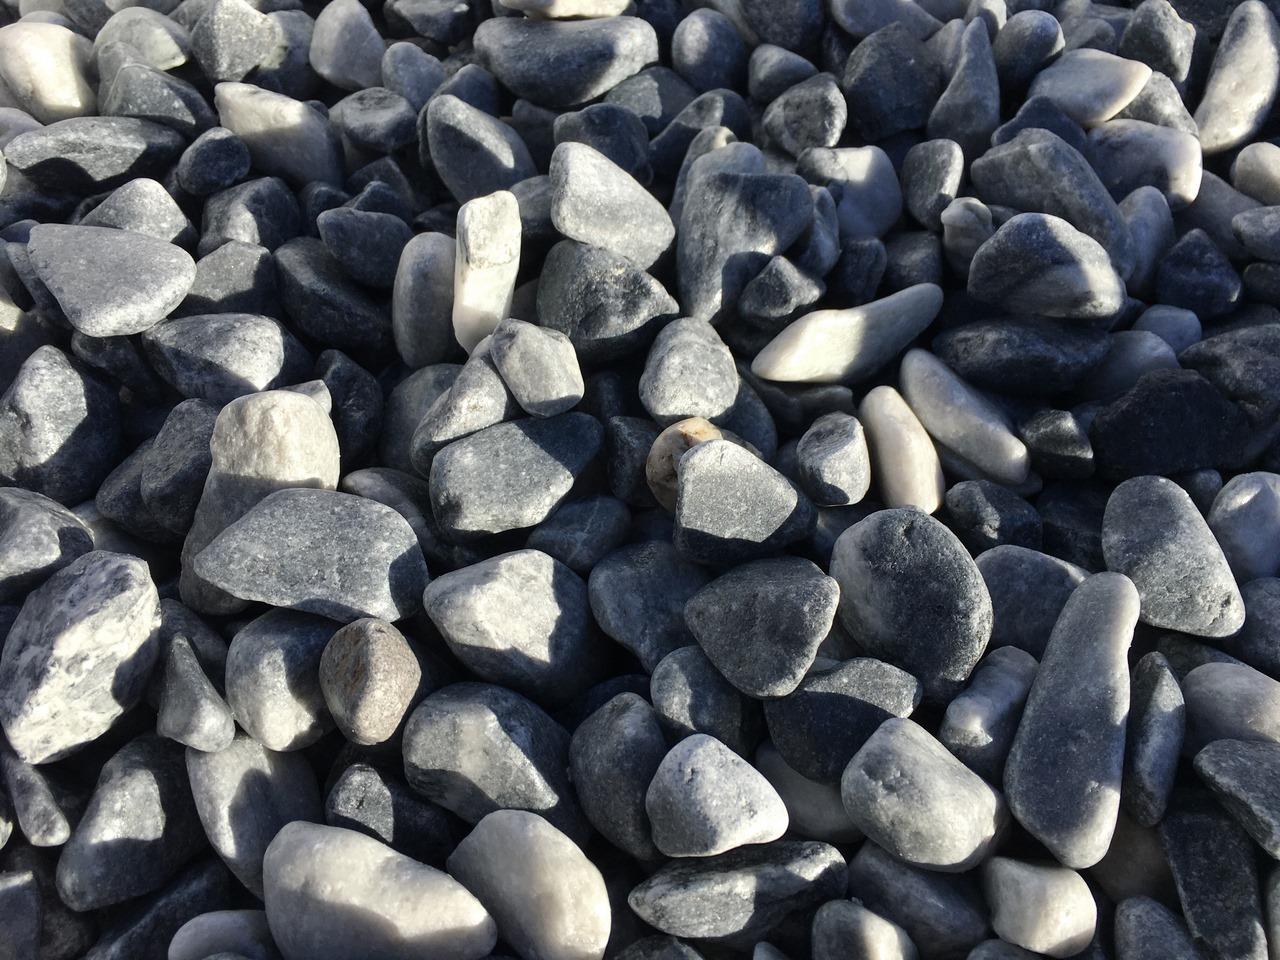 Piedras grises redondeadas para decorar jardines